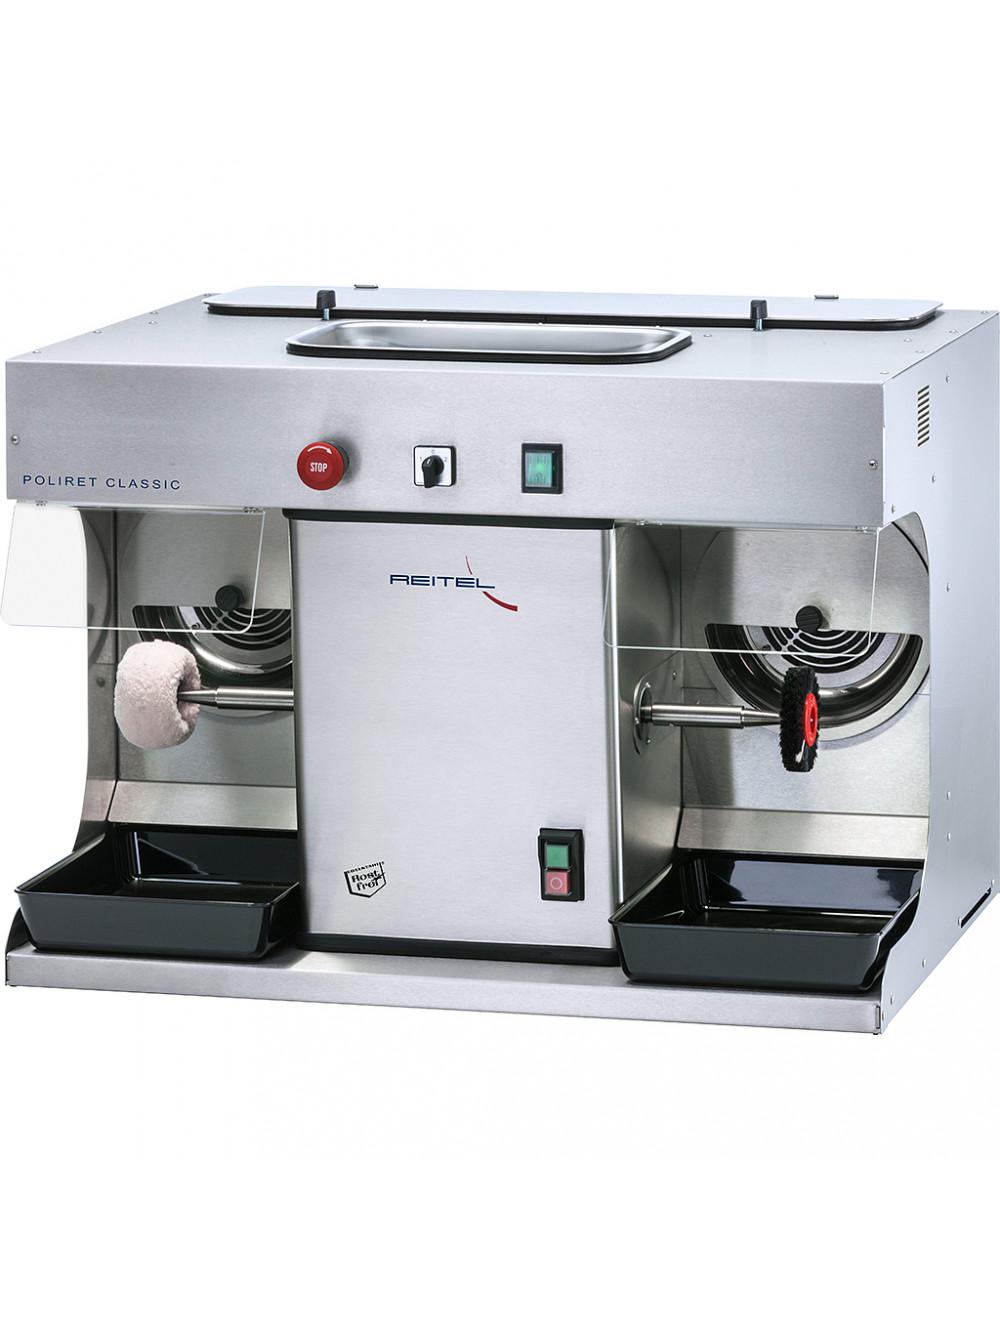 Das Produkt Reitel POLIRET CLASSIC Poliergerät 11111000 aus dem Global-dent online shop.